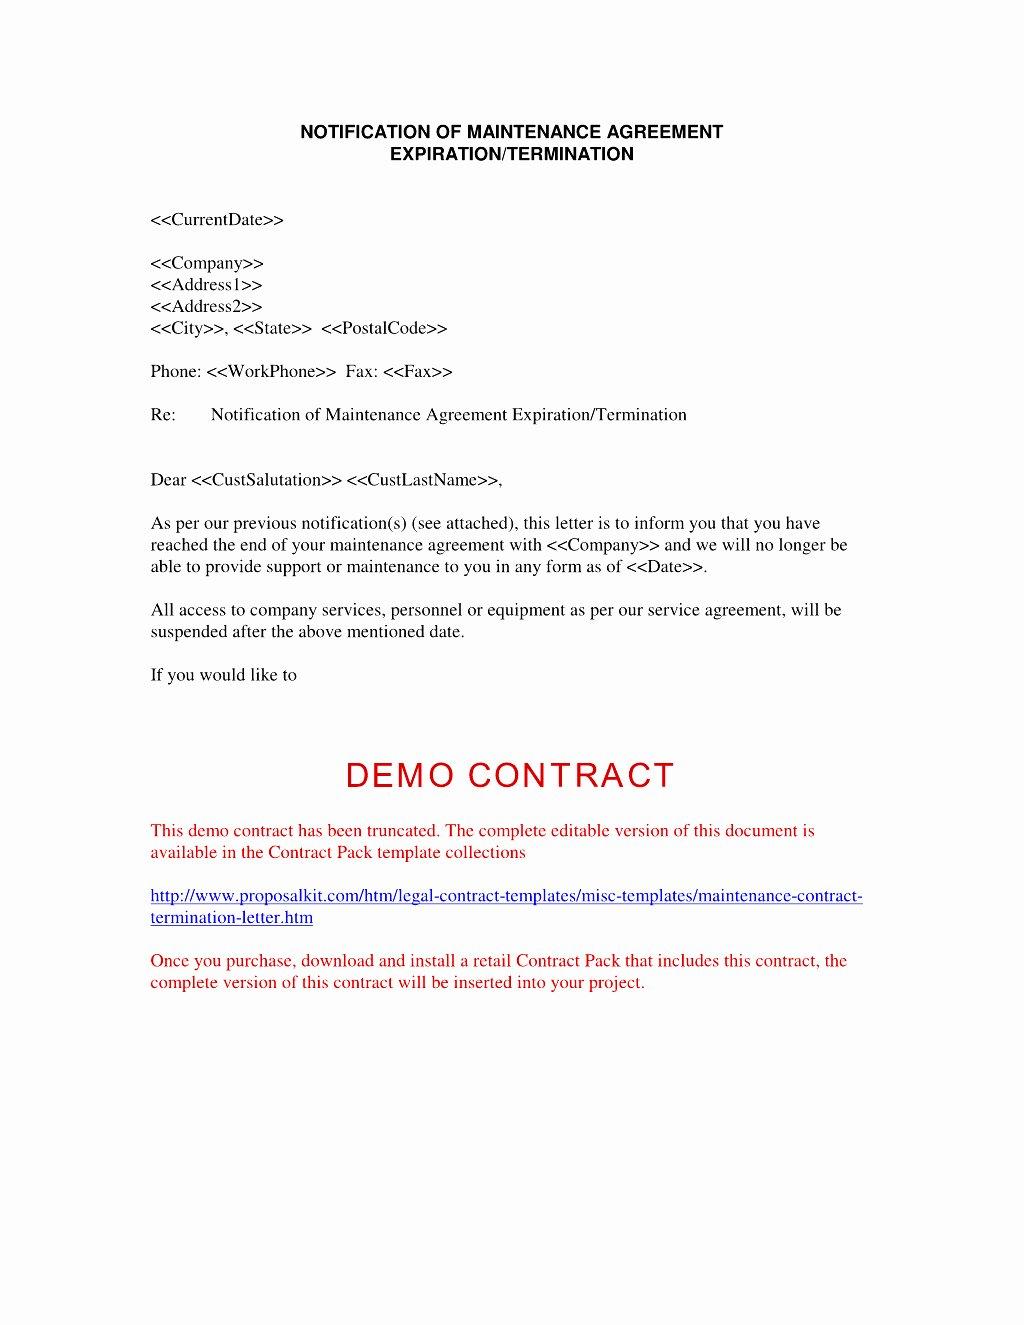 Client Termination Letter Template Fresh Business Contract Termination Letter Template Samples